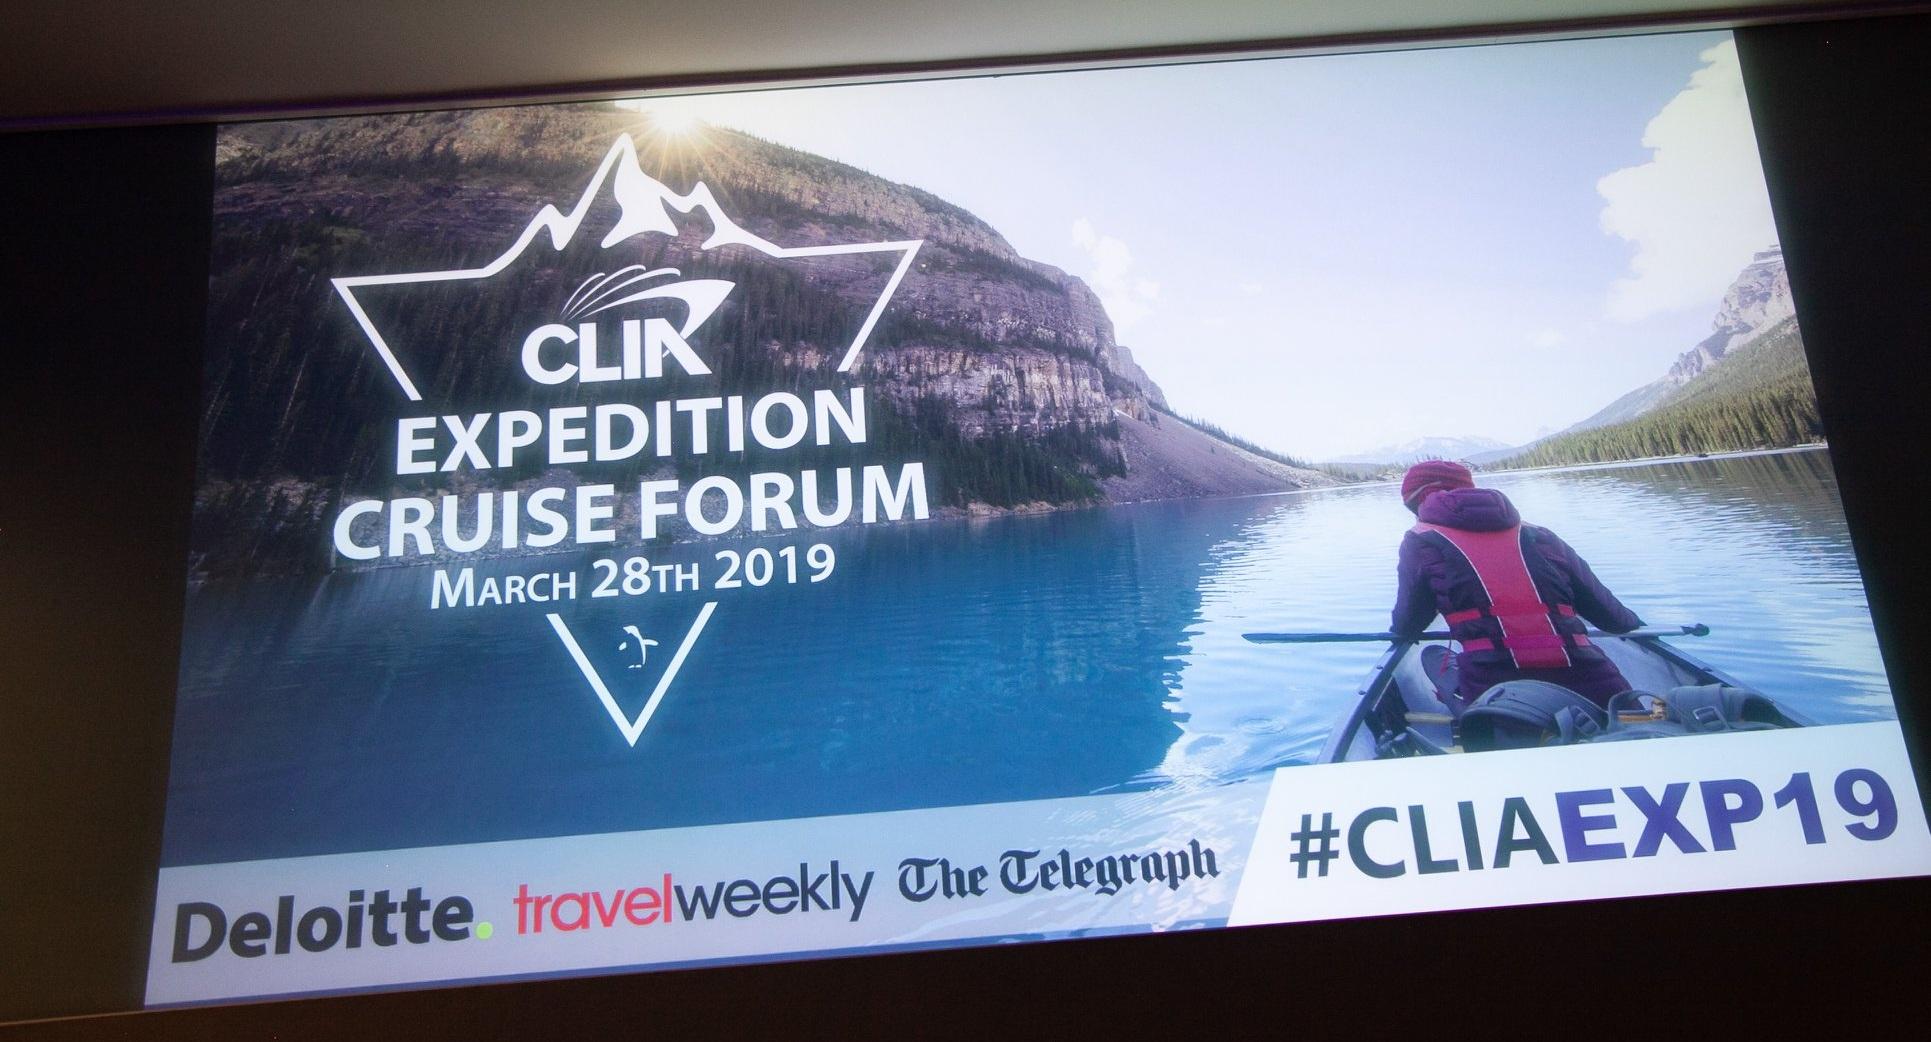 CLIA Expedition Cruise Forum Event